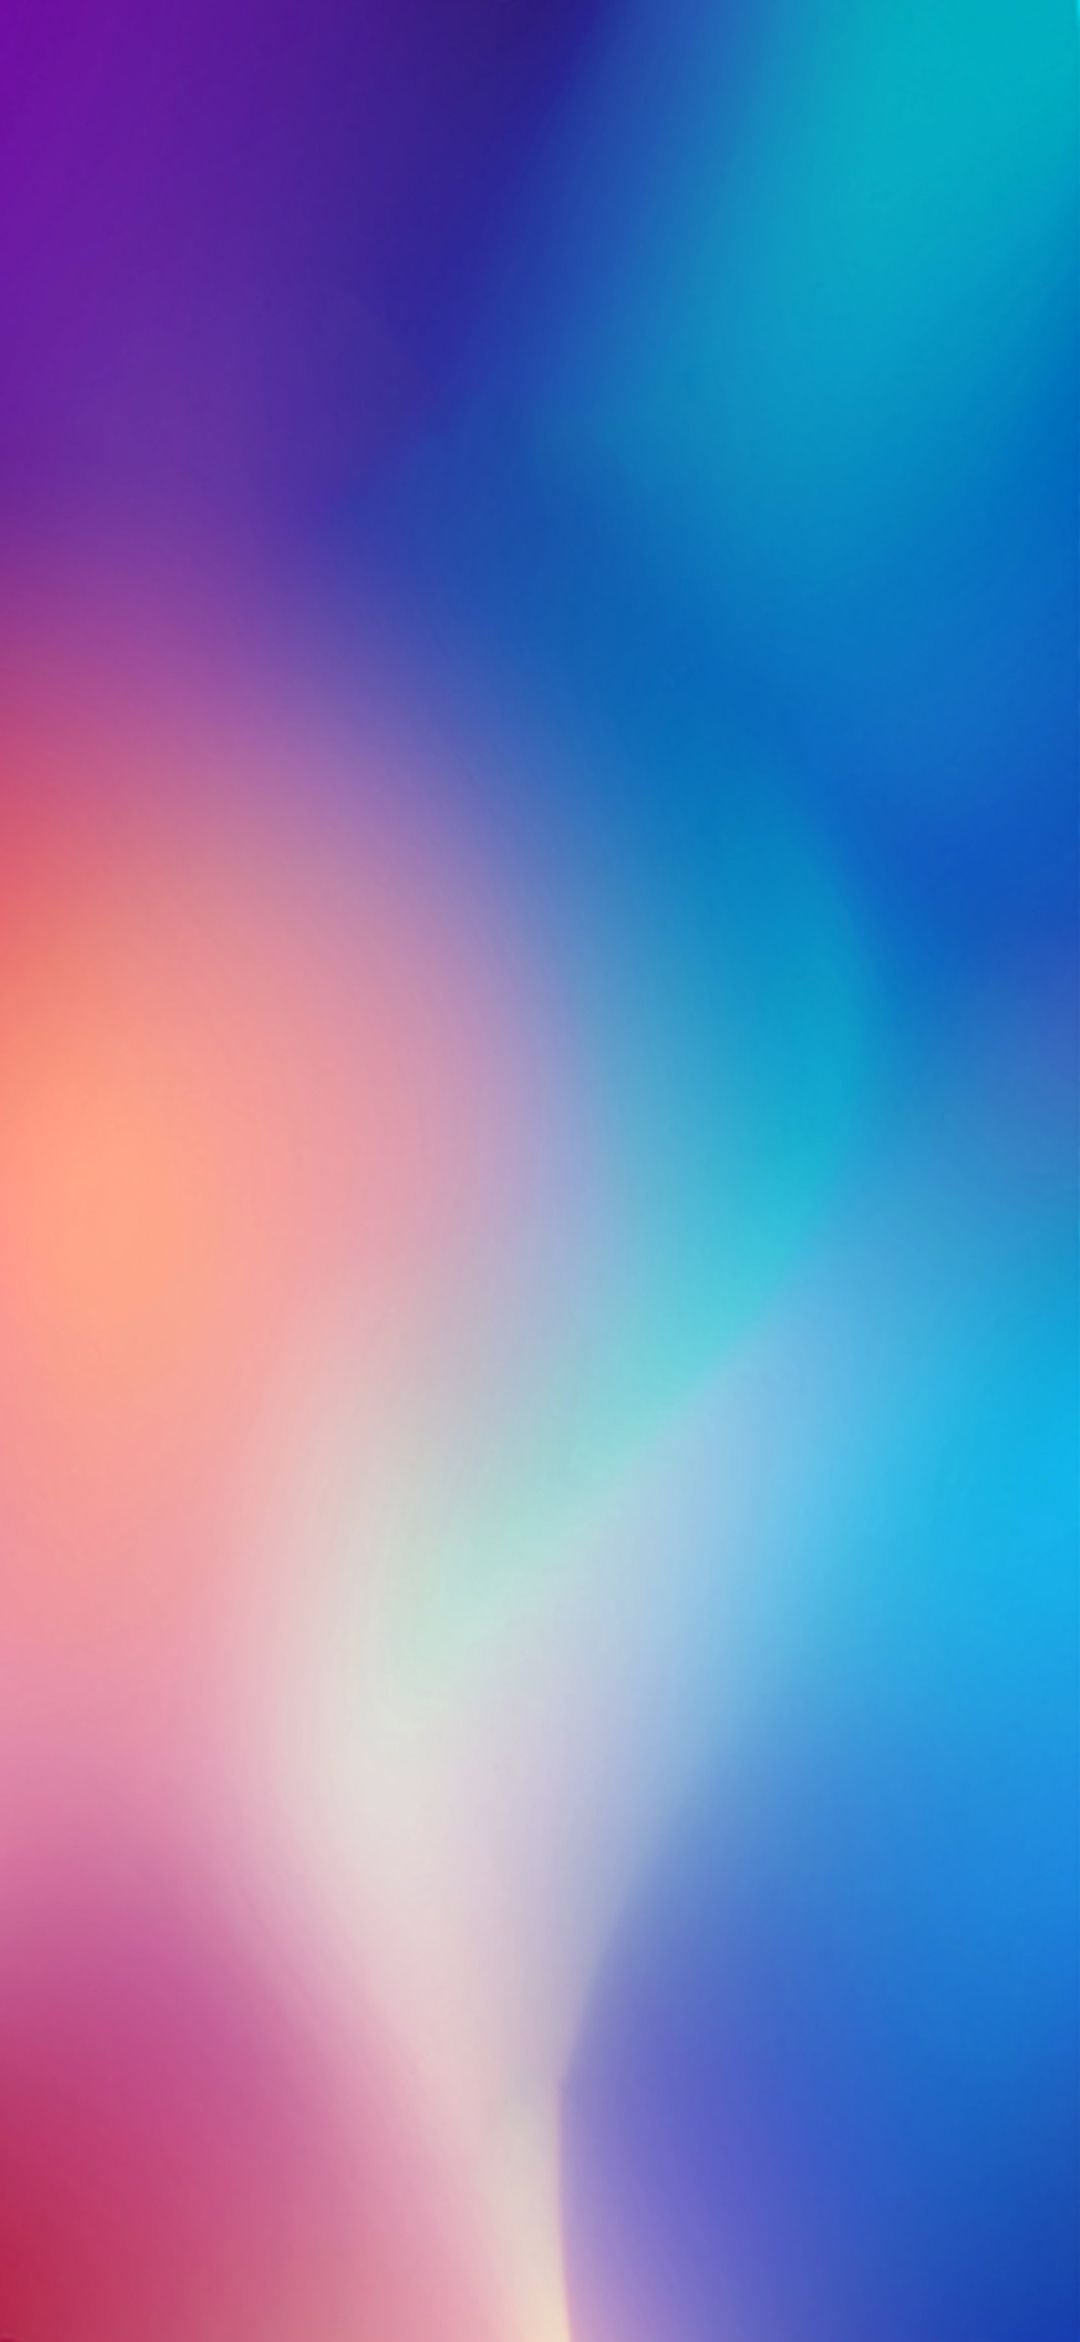 Xiaomi CC9 Stock Wallpapers (Full HD+) - Download | DroidViews